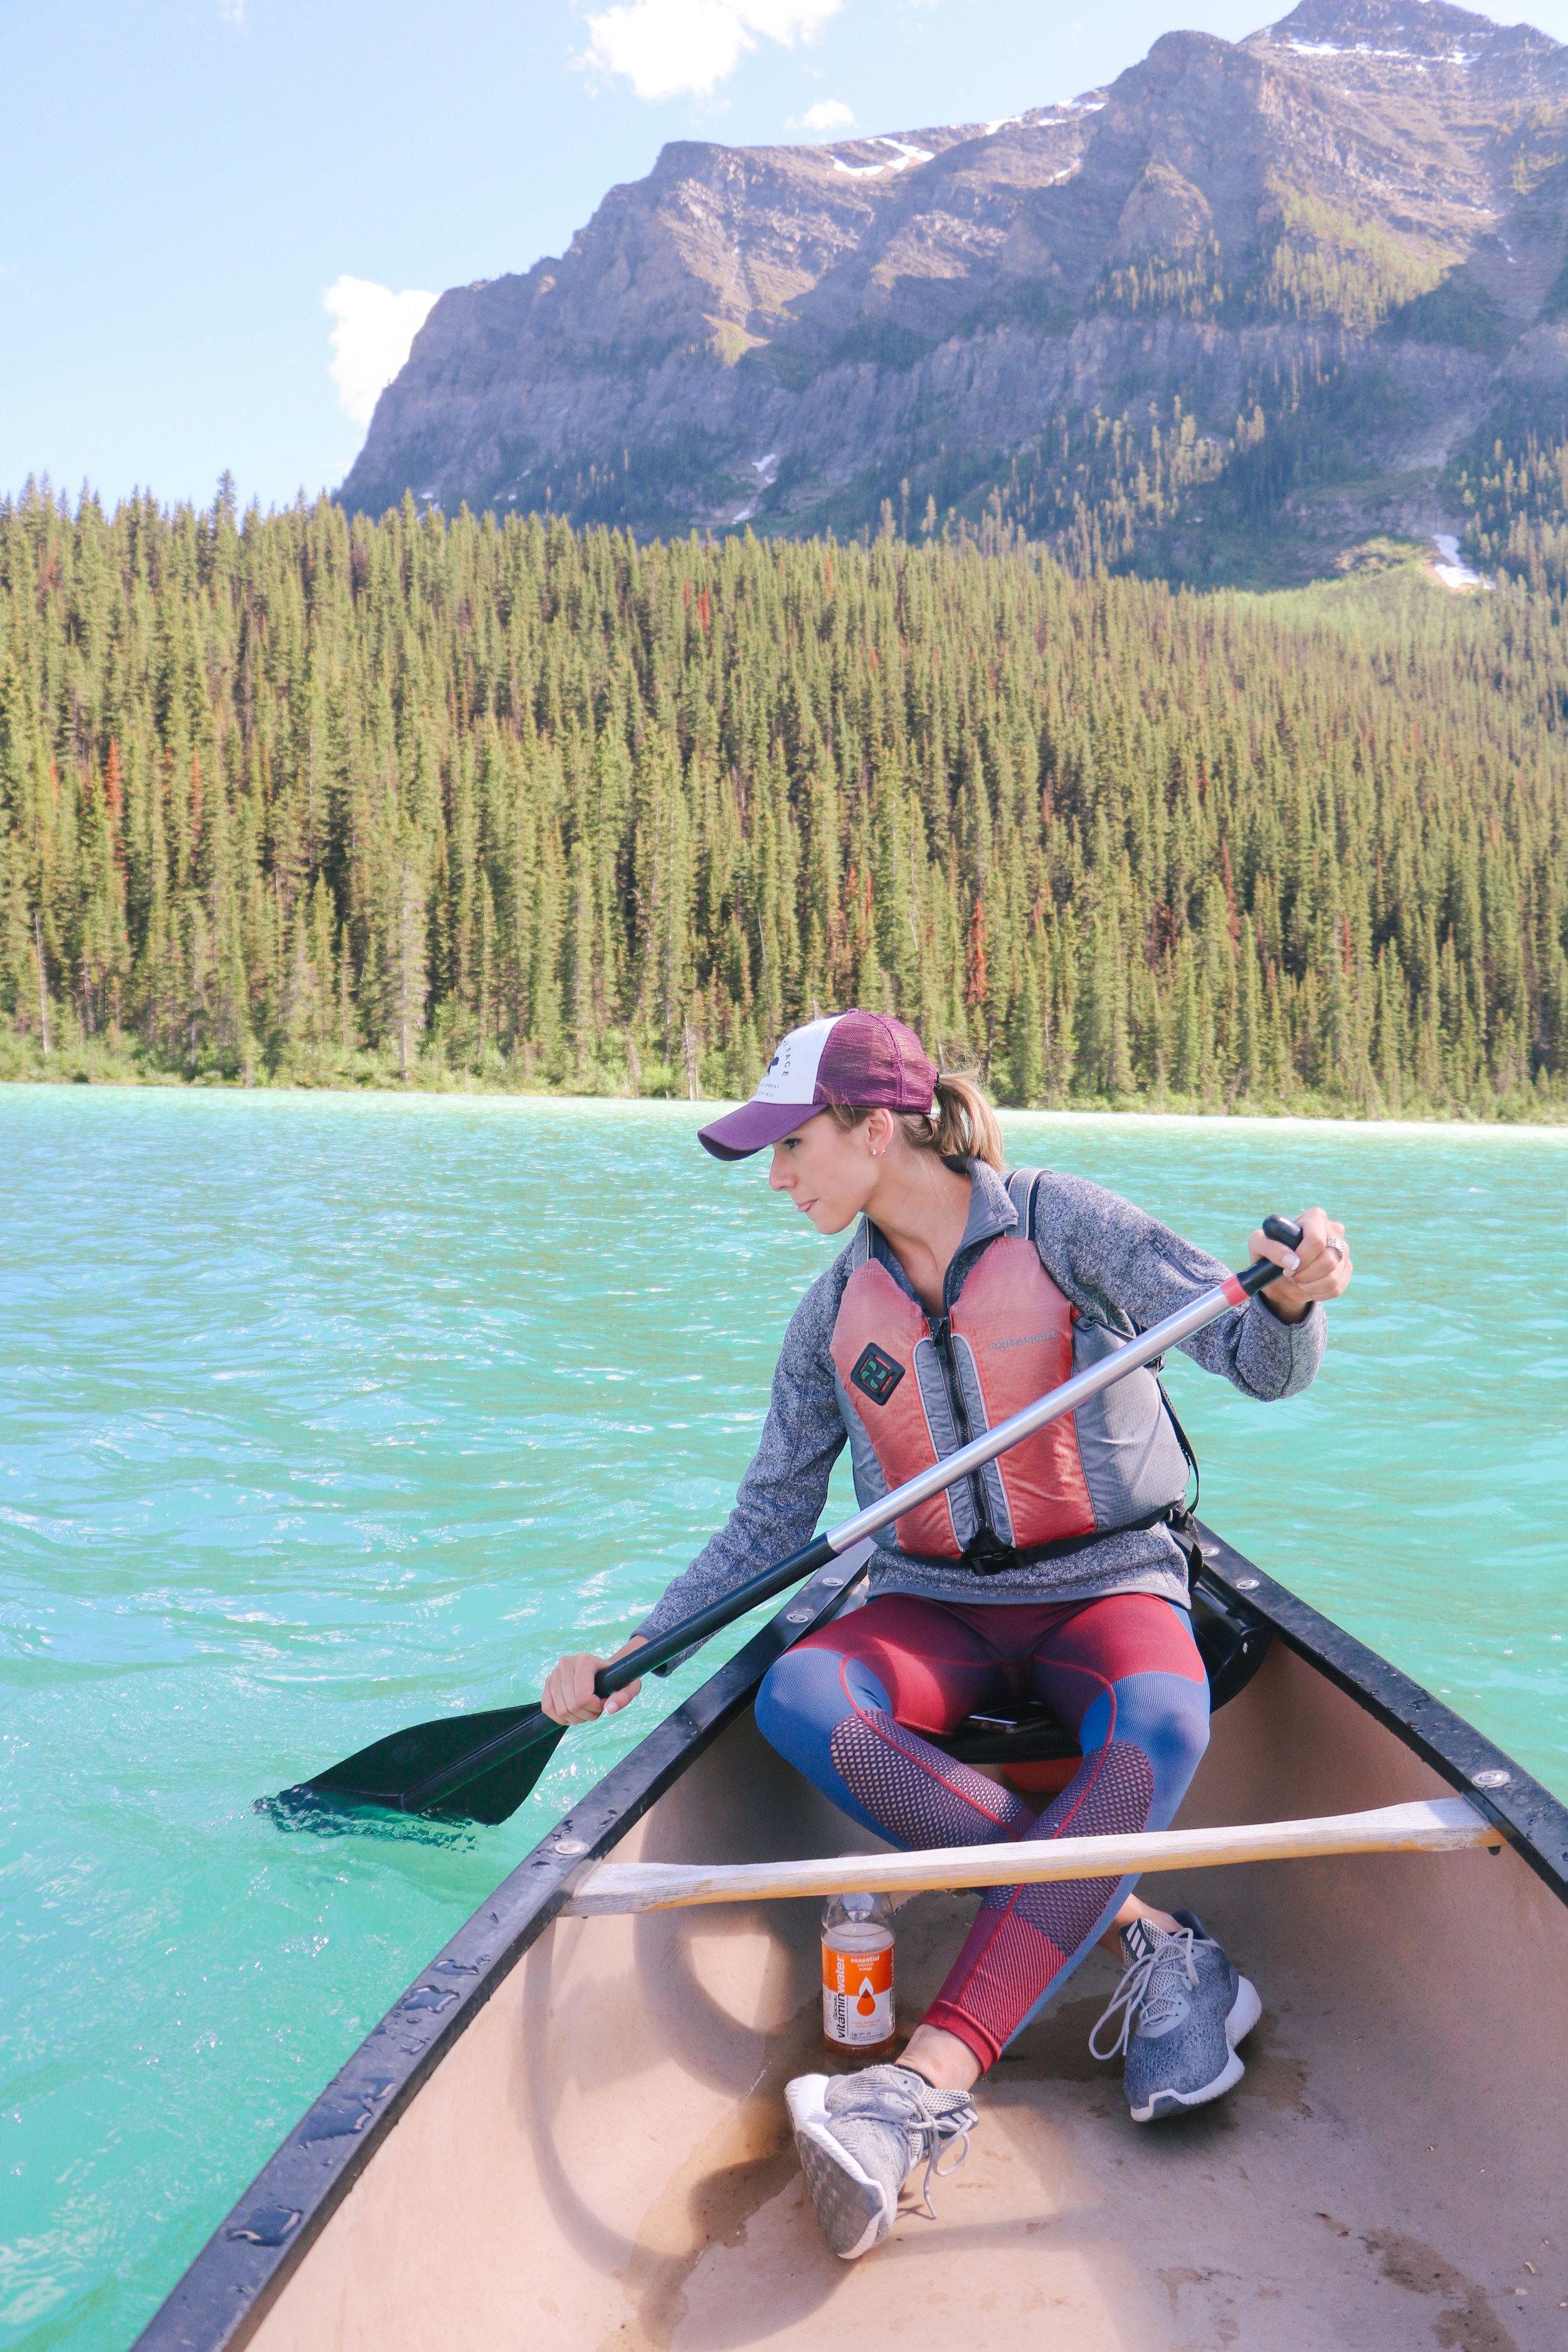 Hotel Spotlight: Fairmont Chateau Lake Louise